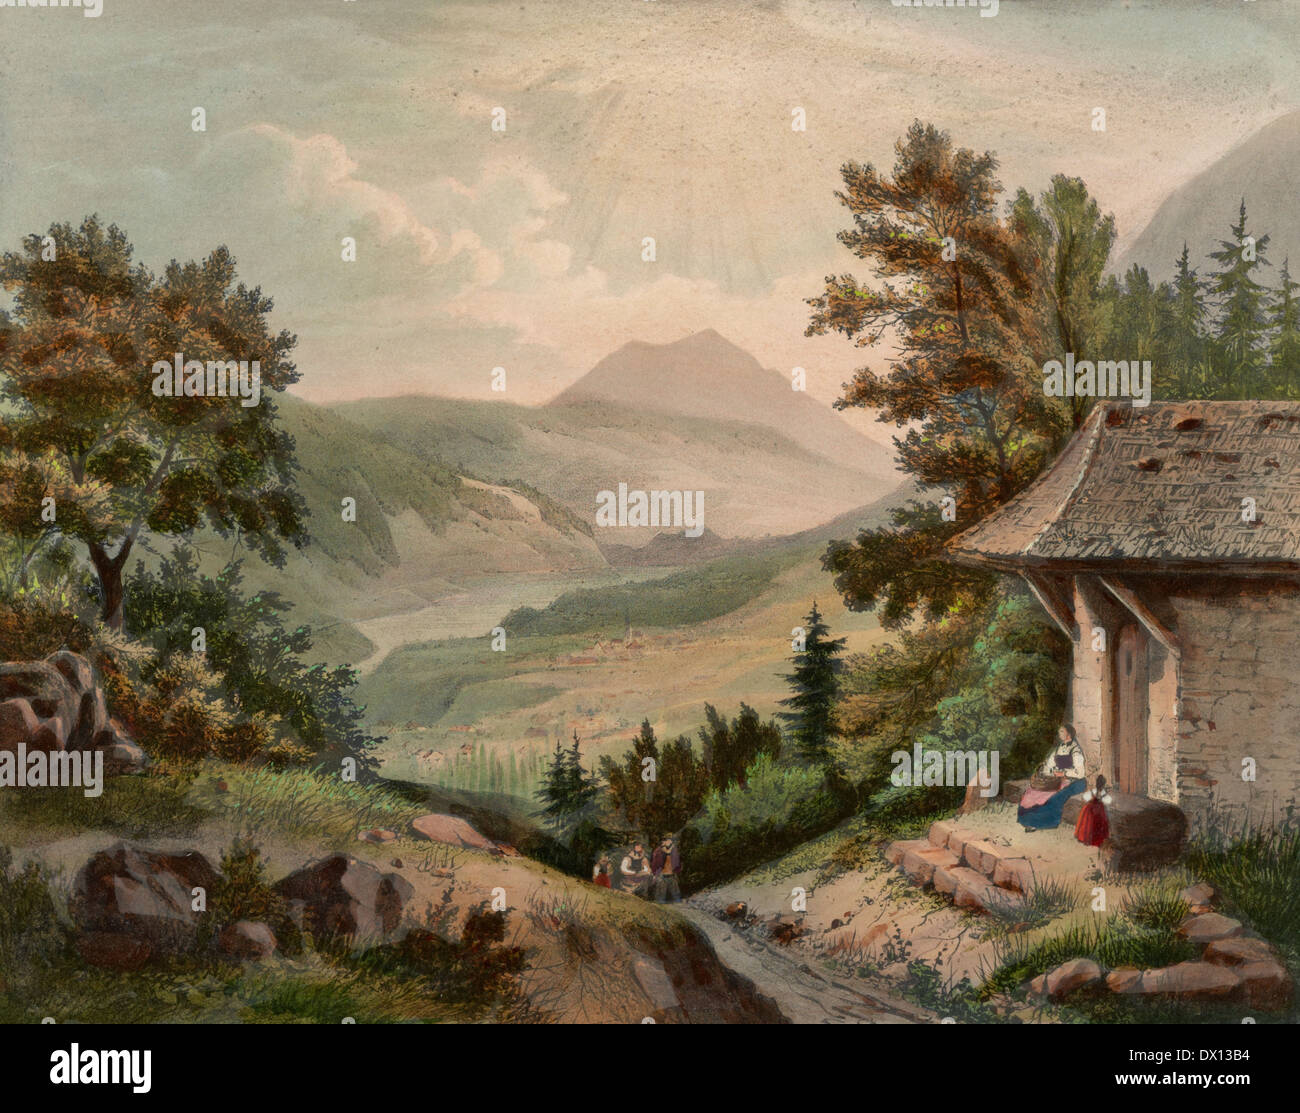 Mount Pilatus seen from Bruning, Switzerland, circa 1900 - Stock Image